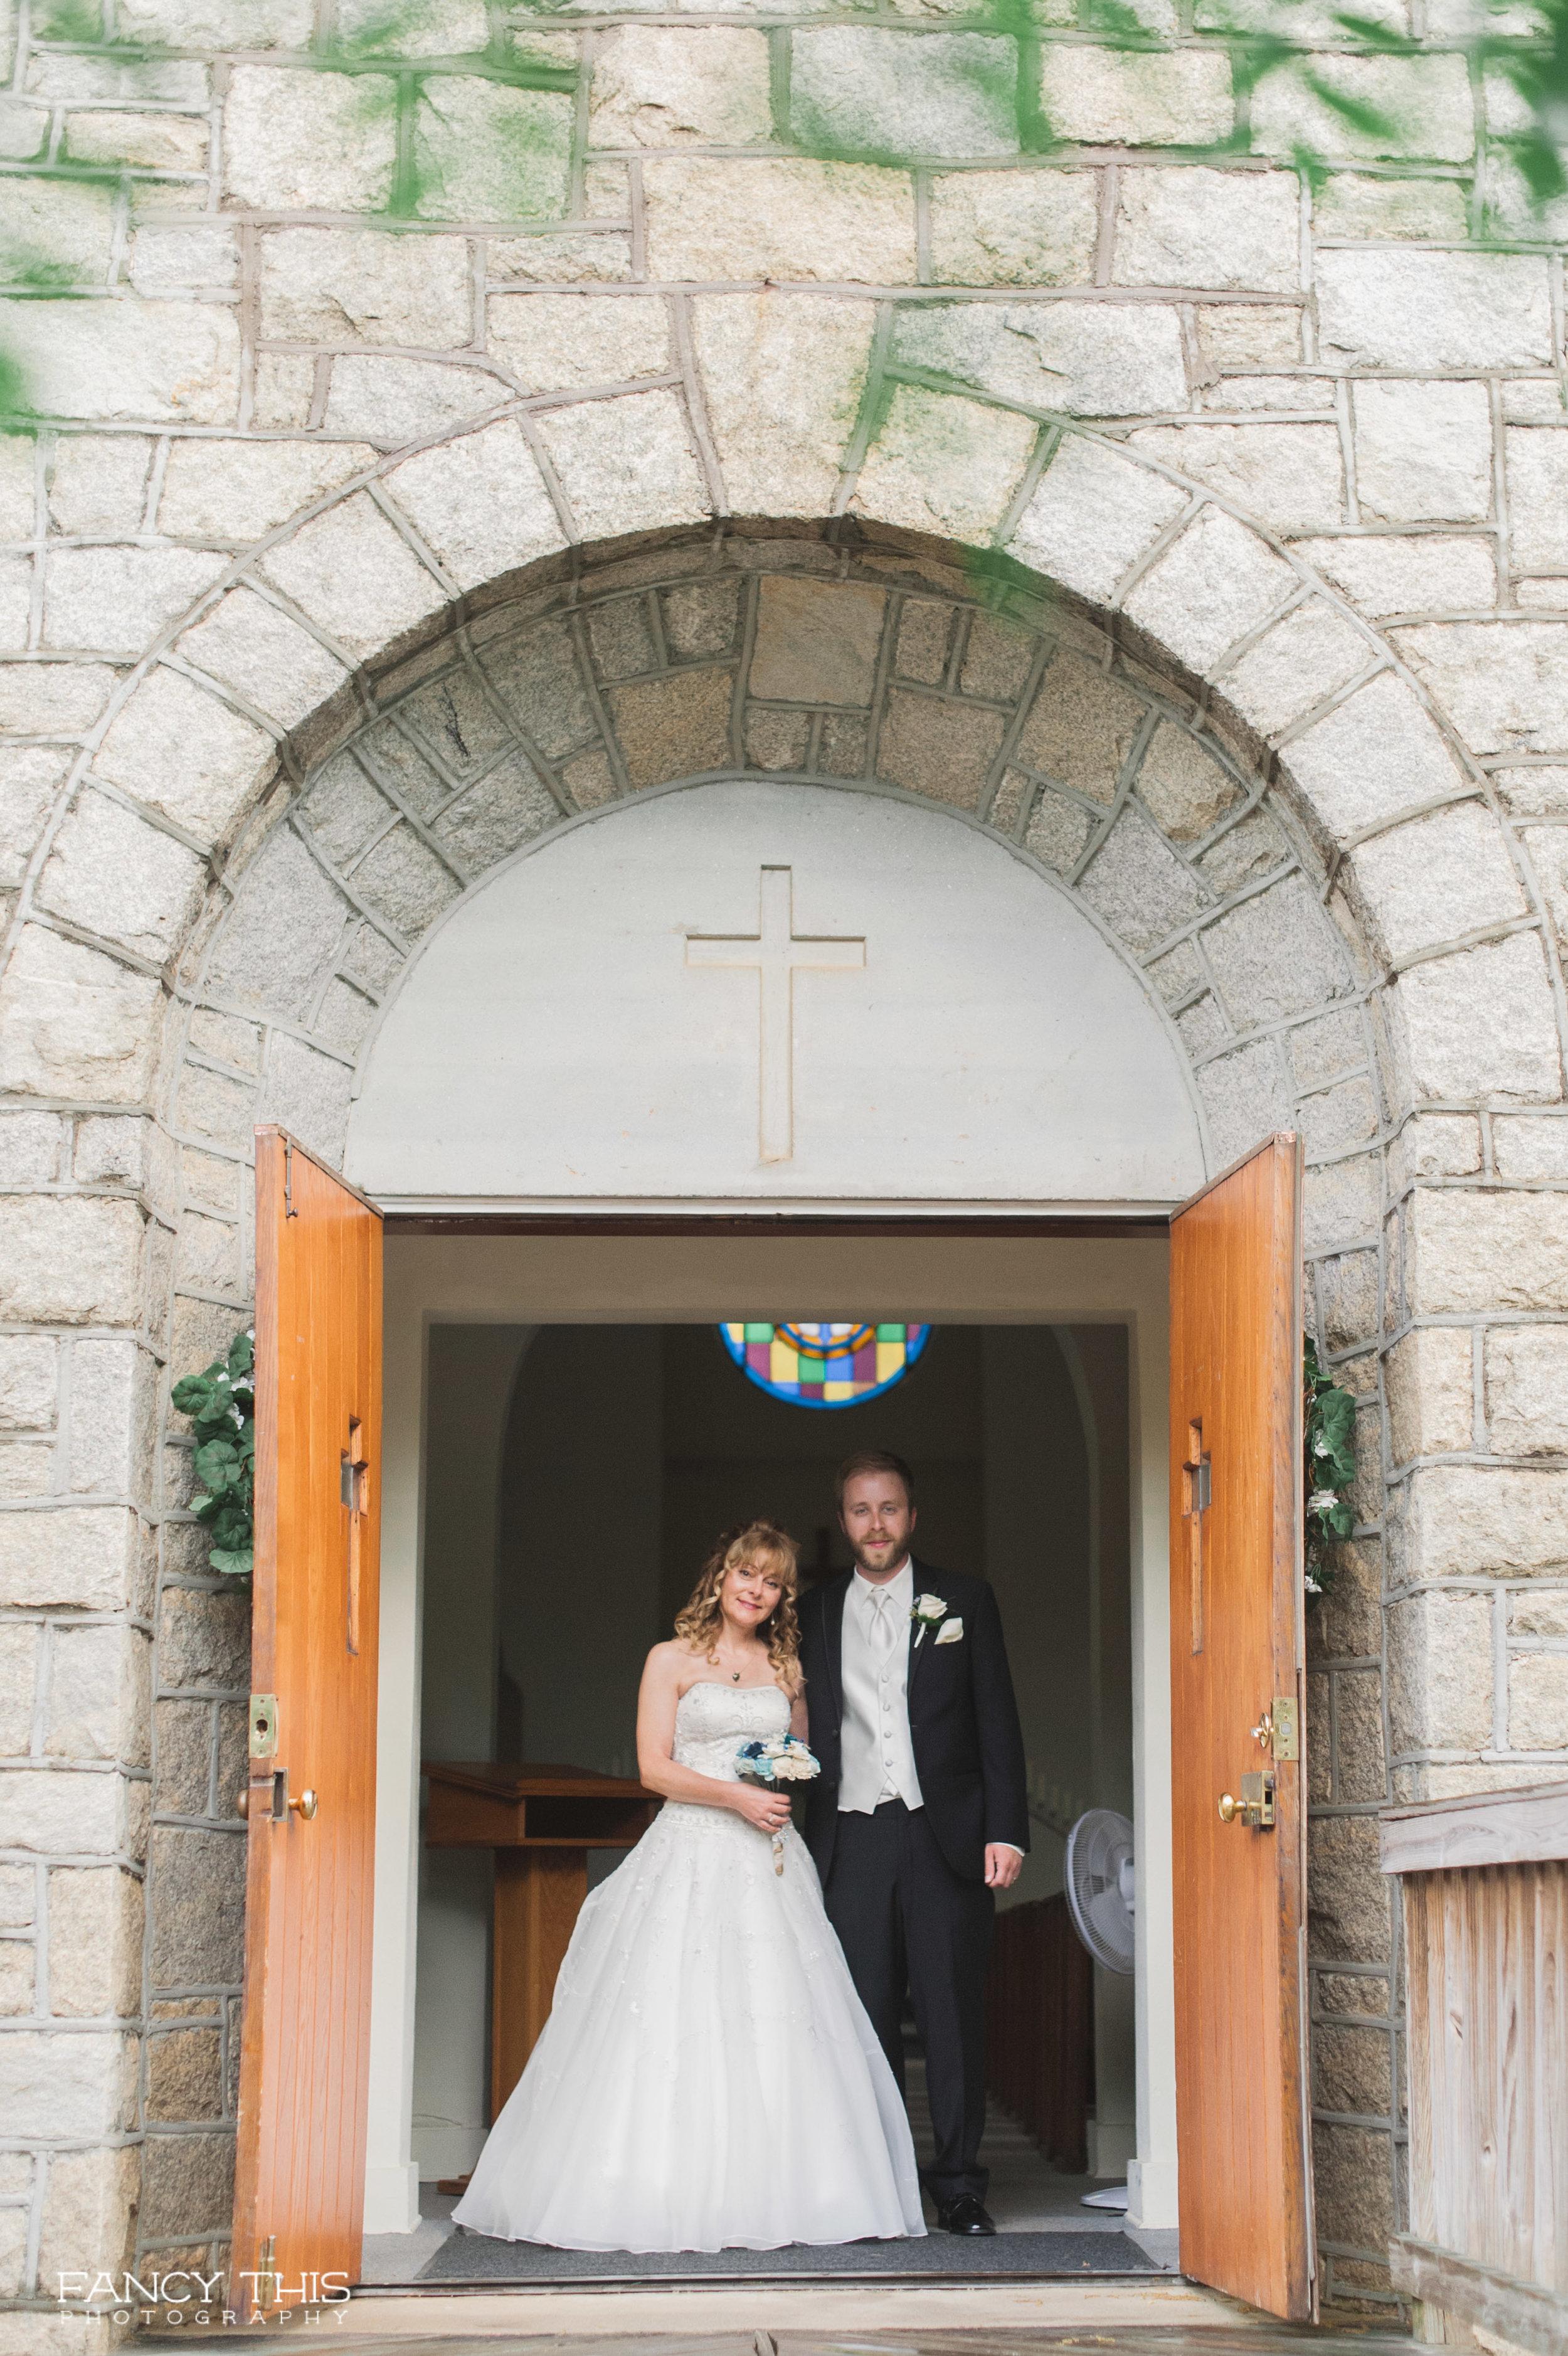 courtneyjasonwedding_socialmediaready157.jpg